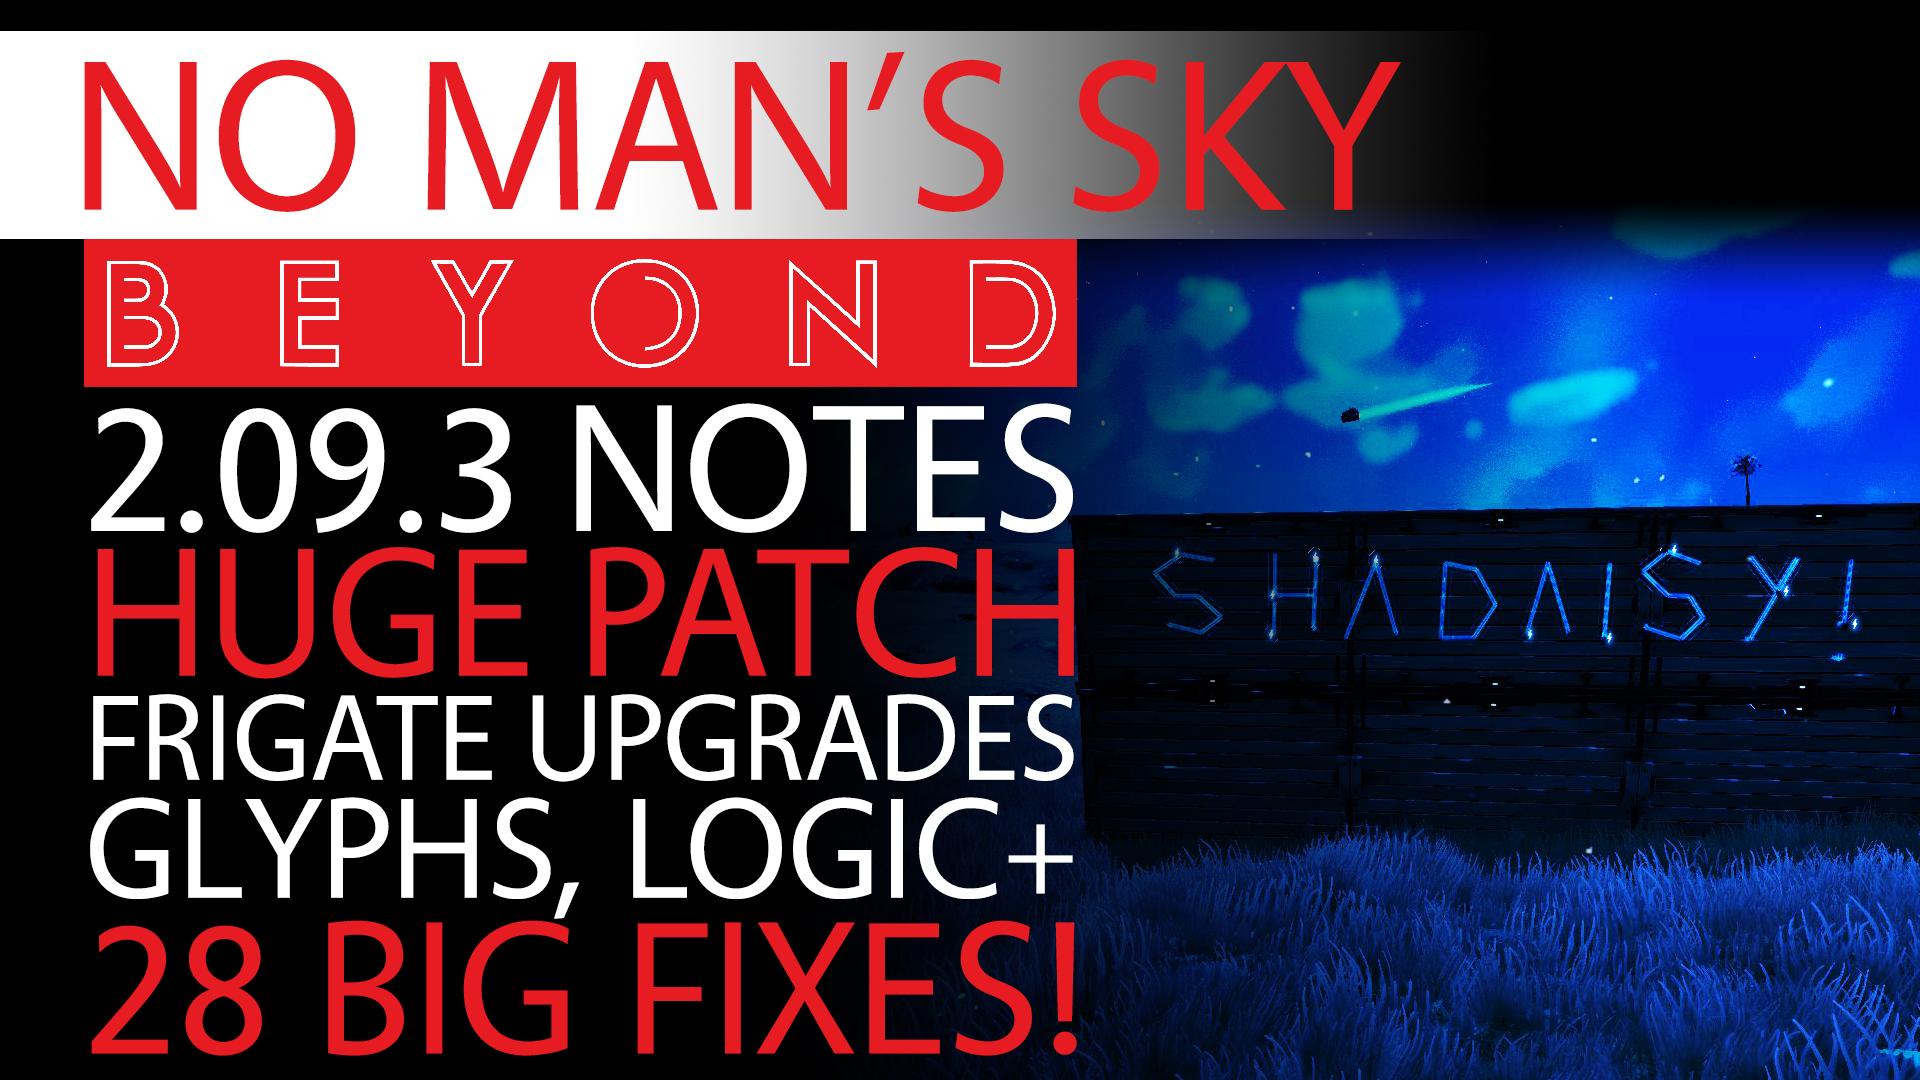 No Man's Sky Beyond News HUGE Fix Patch 2.09.3 Glyphs, Lightbox, Refiners, Freighters, Frigates+ Thumbnail